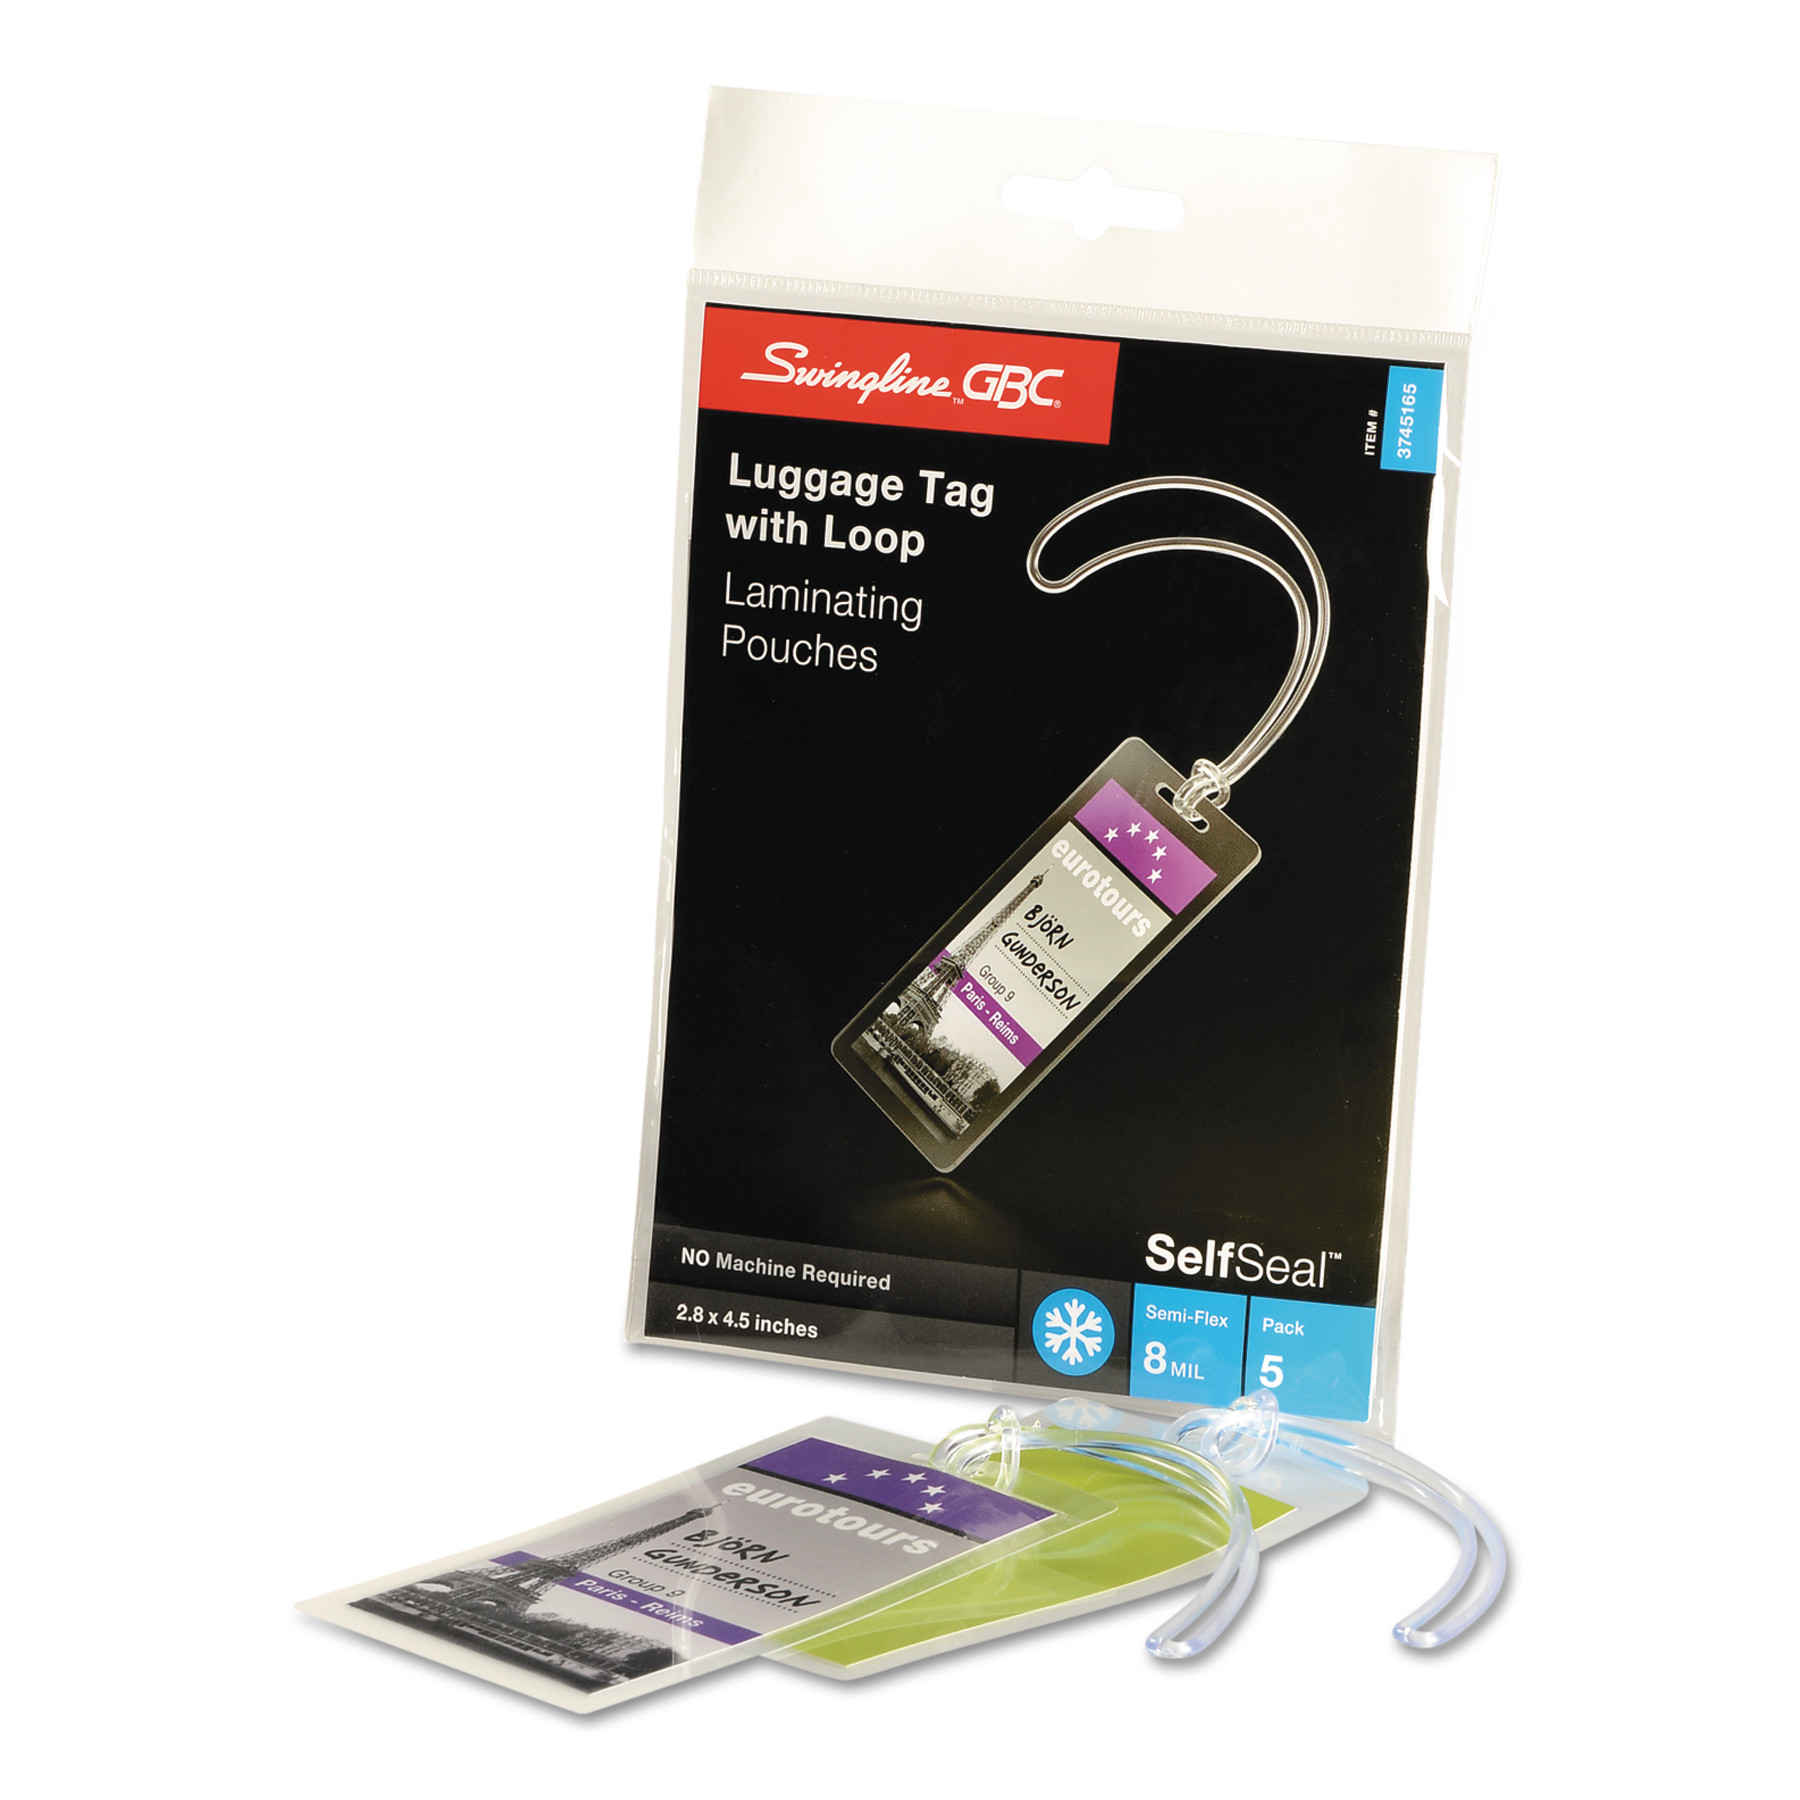 Swingline GBC, SWI3745165, SelfSeal™ Self Adhesive Laminating Pouches, 5 / Pack, Clear